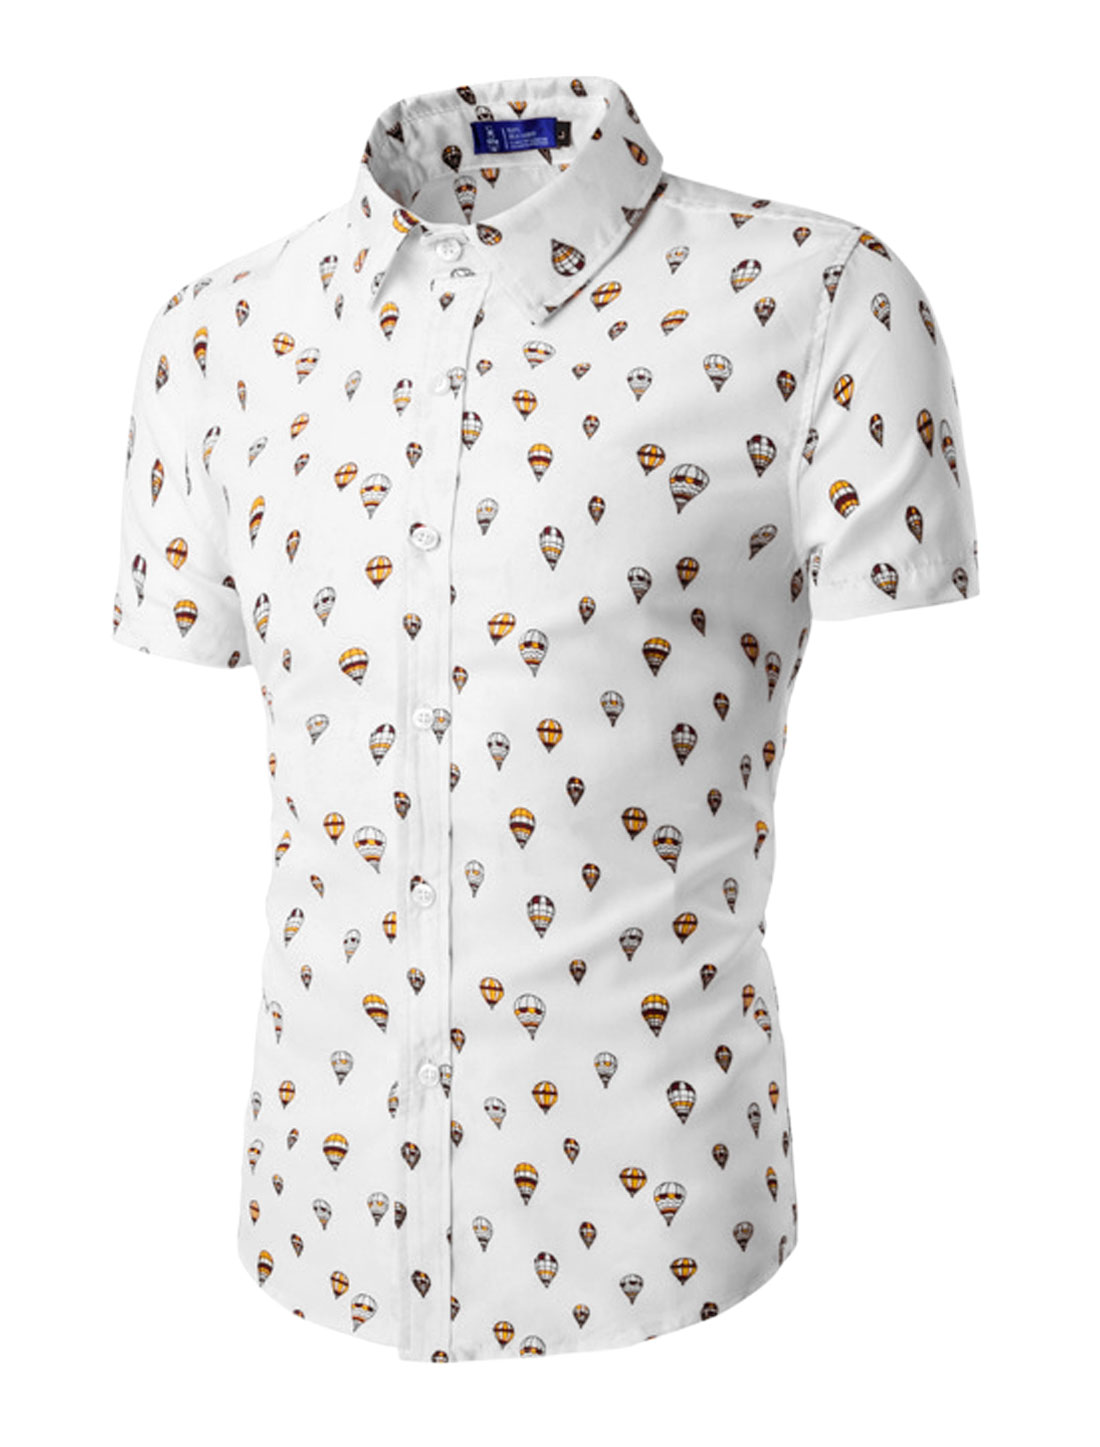 Men Short Sleeves Fire Balloon Pattern Button Down Shirt White M